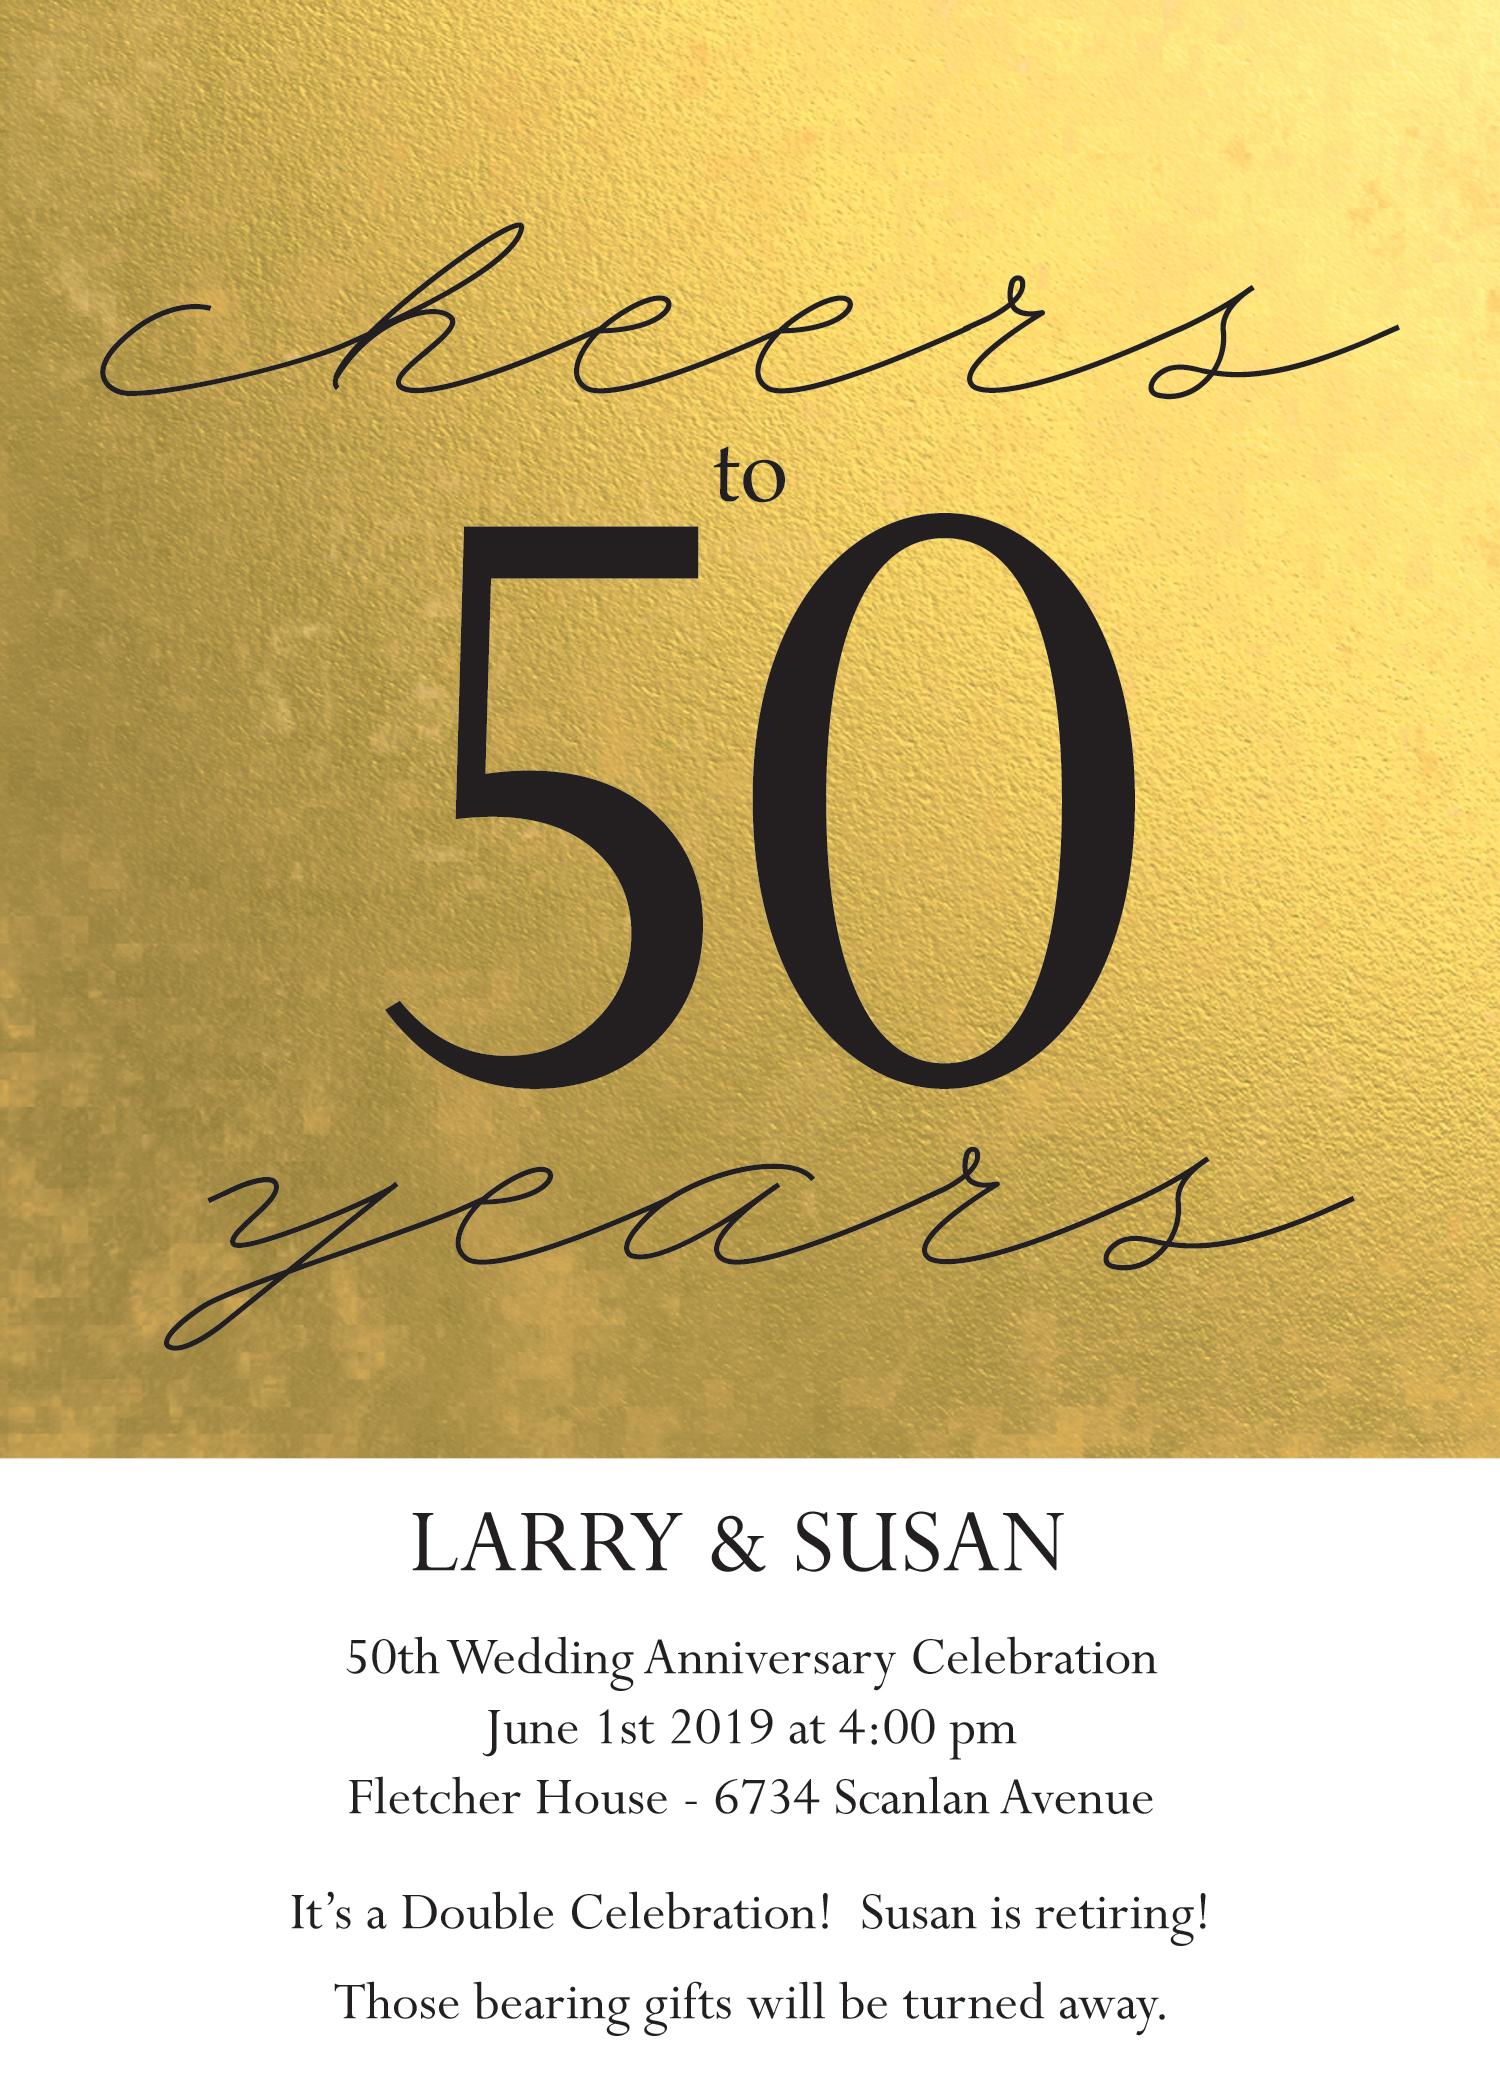 50 wedding anniversary invitation